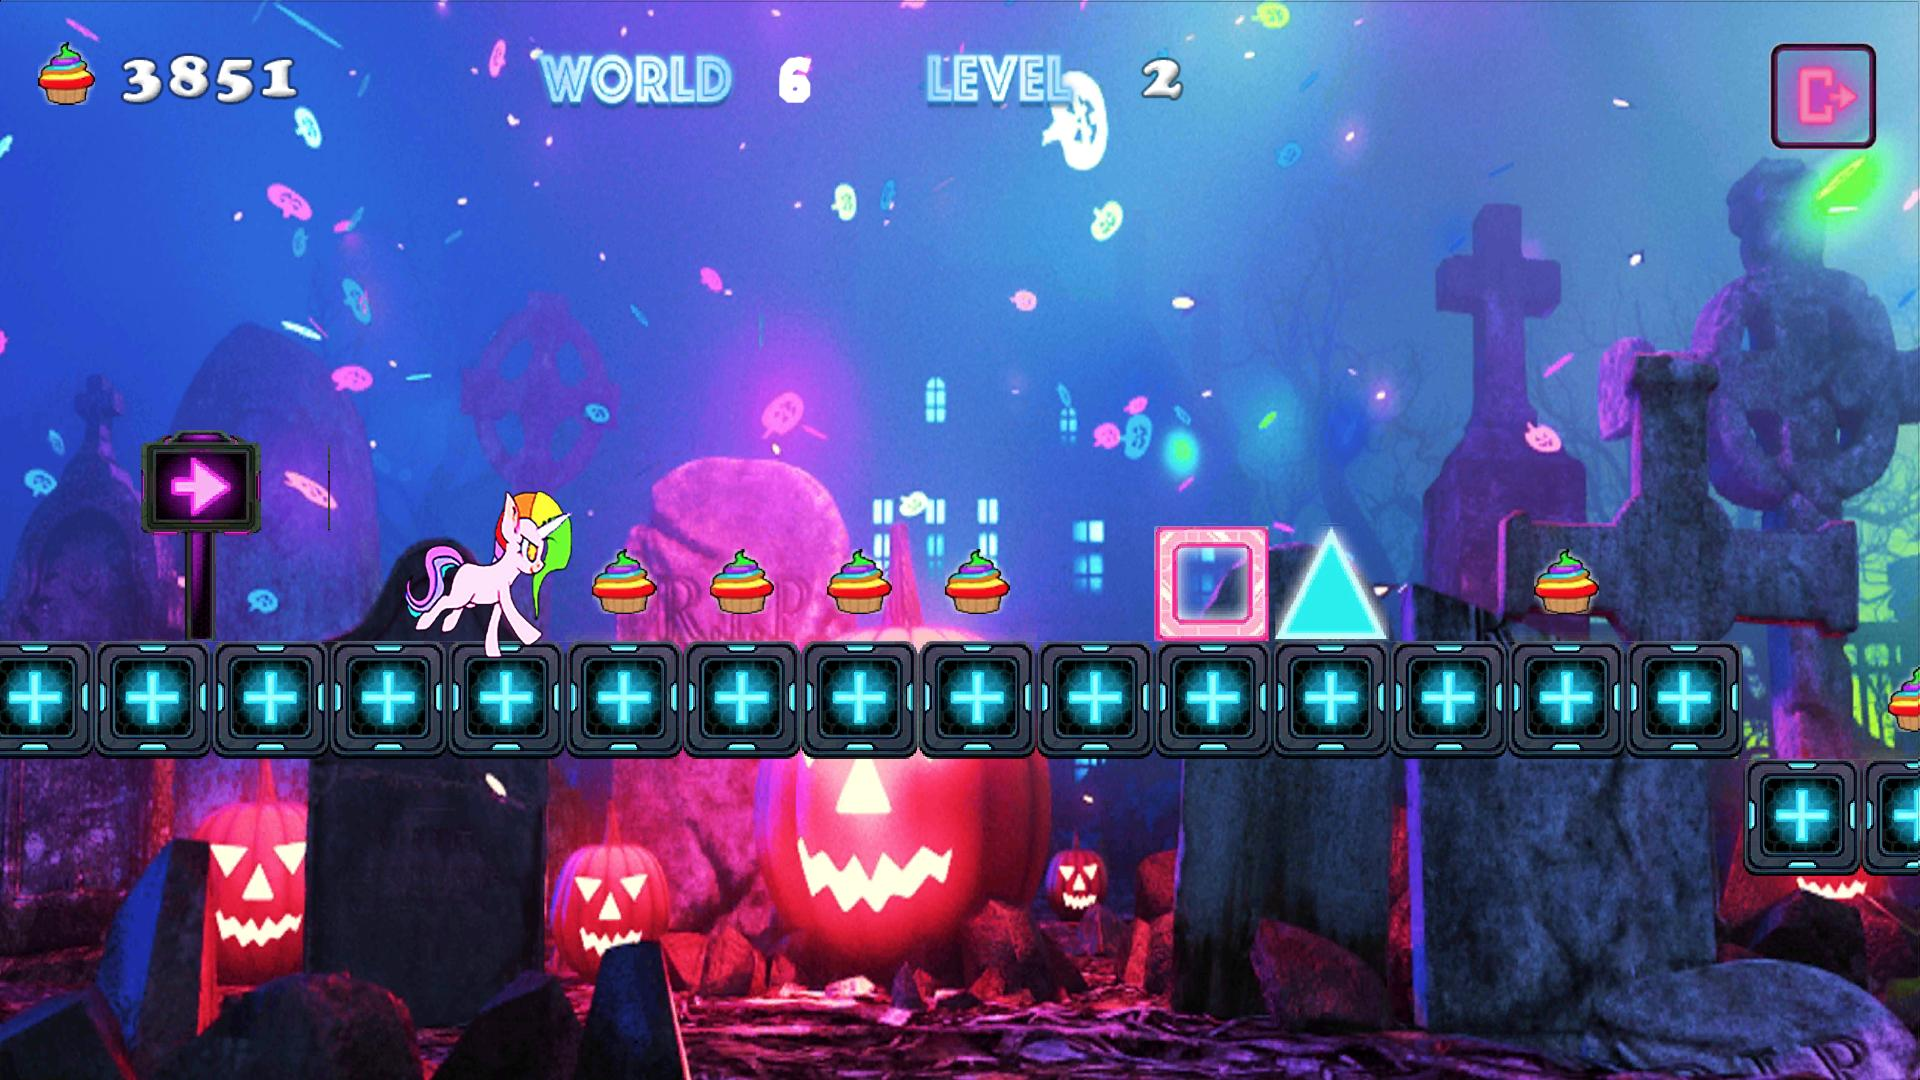 Unicorn Dash Neon Lights Unicorn Games mlp games 2.8.105 Screenshot 22